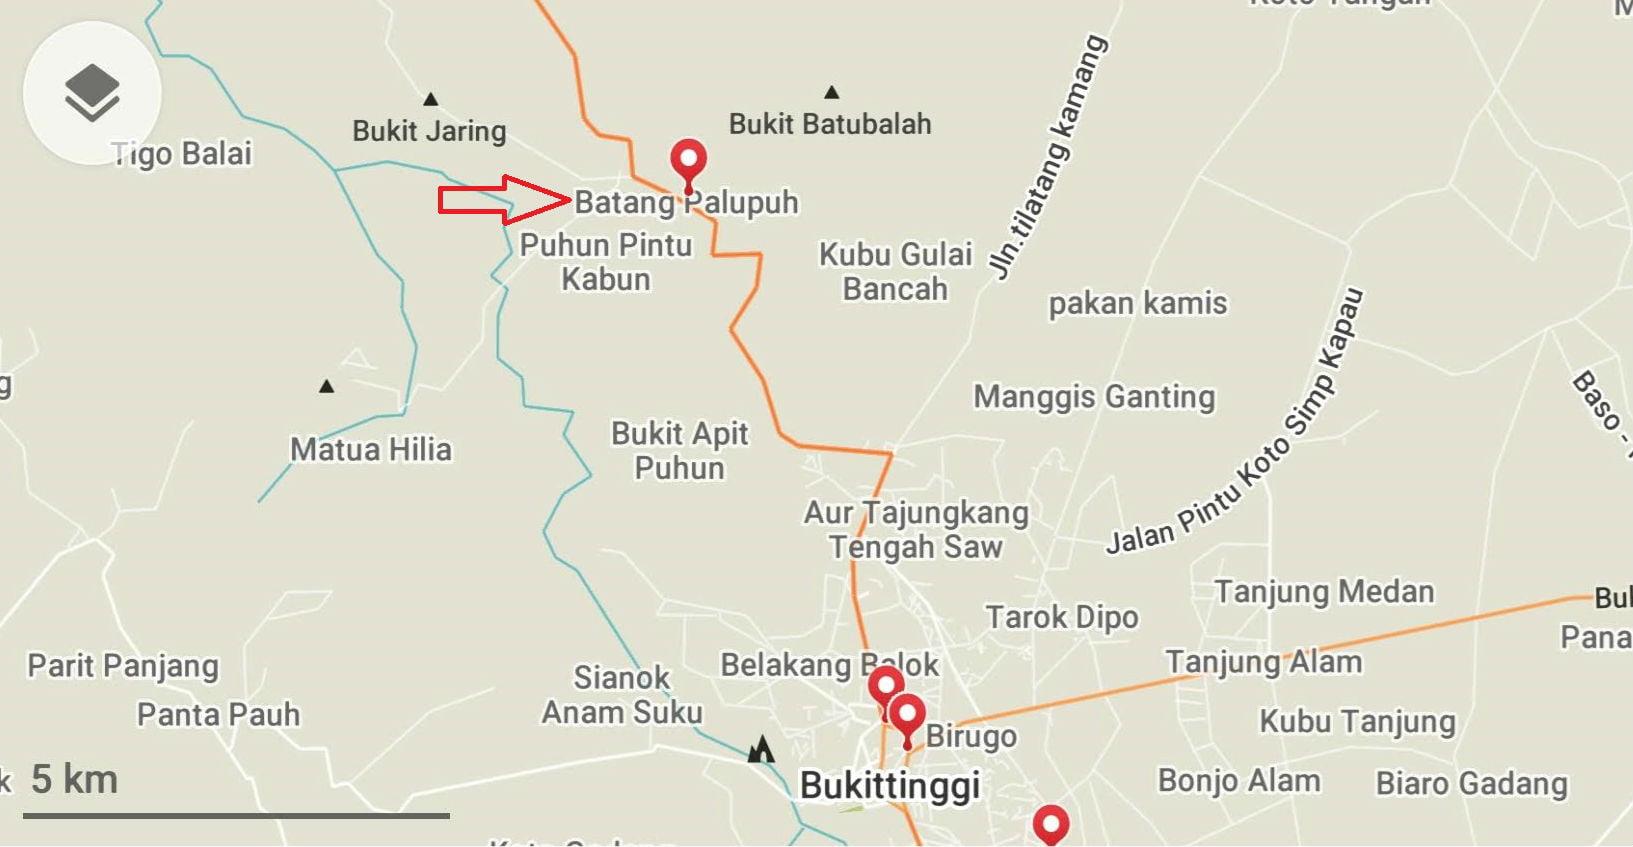 mapa raflesia and luwak center